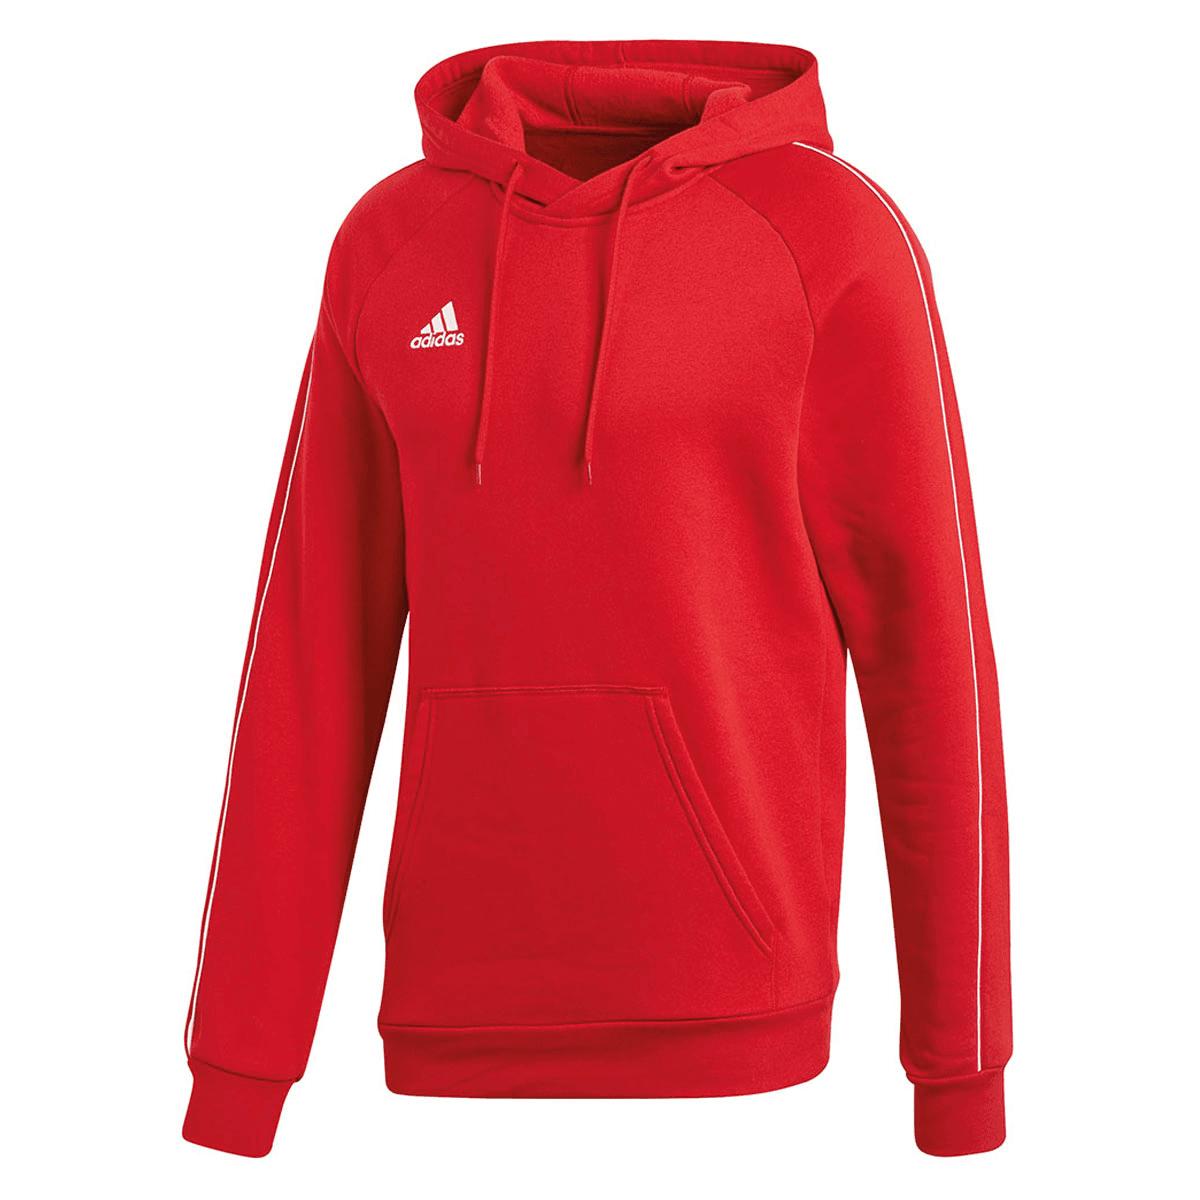 Adidas trui met capuchon Core 18 Hoody rood/wit